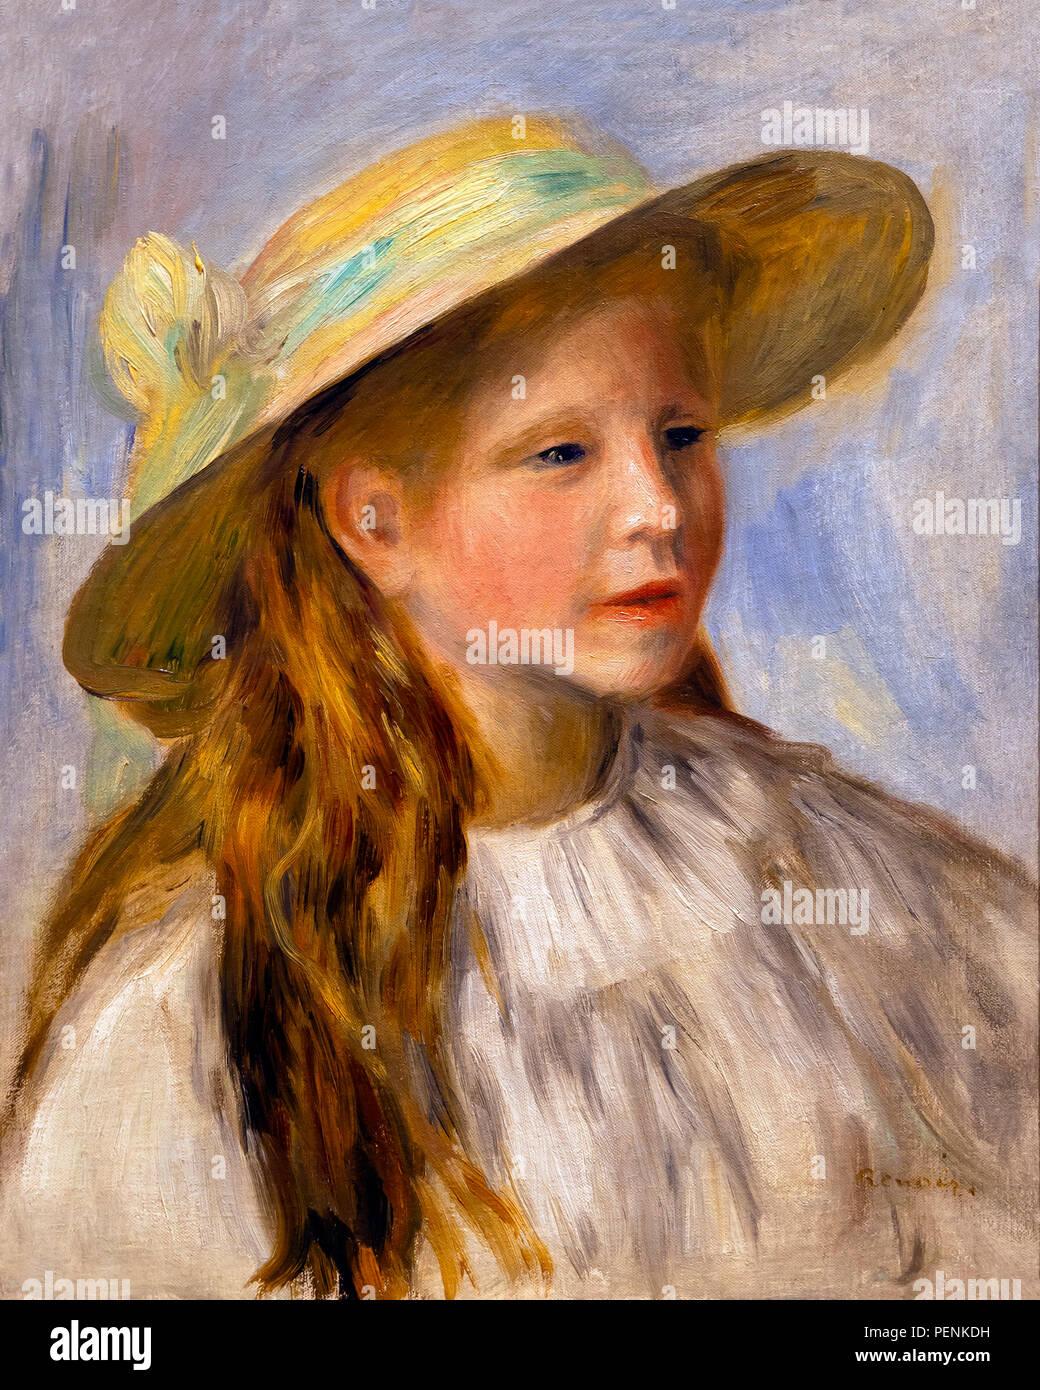 Pierre Auguste Renoir Imágenes De Stock   Pierre Auguste Renoir ... c05239c3332c